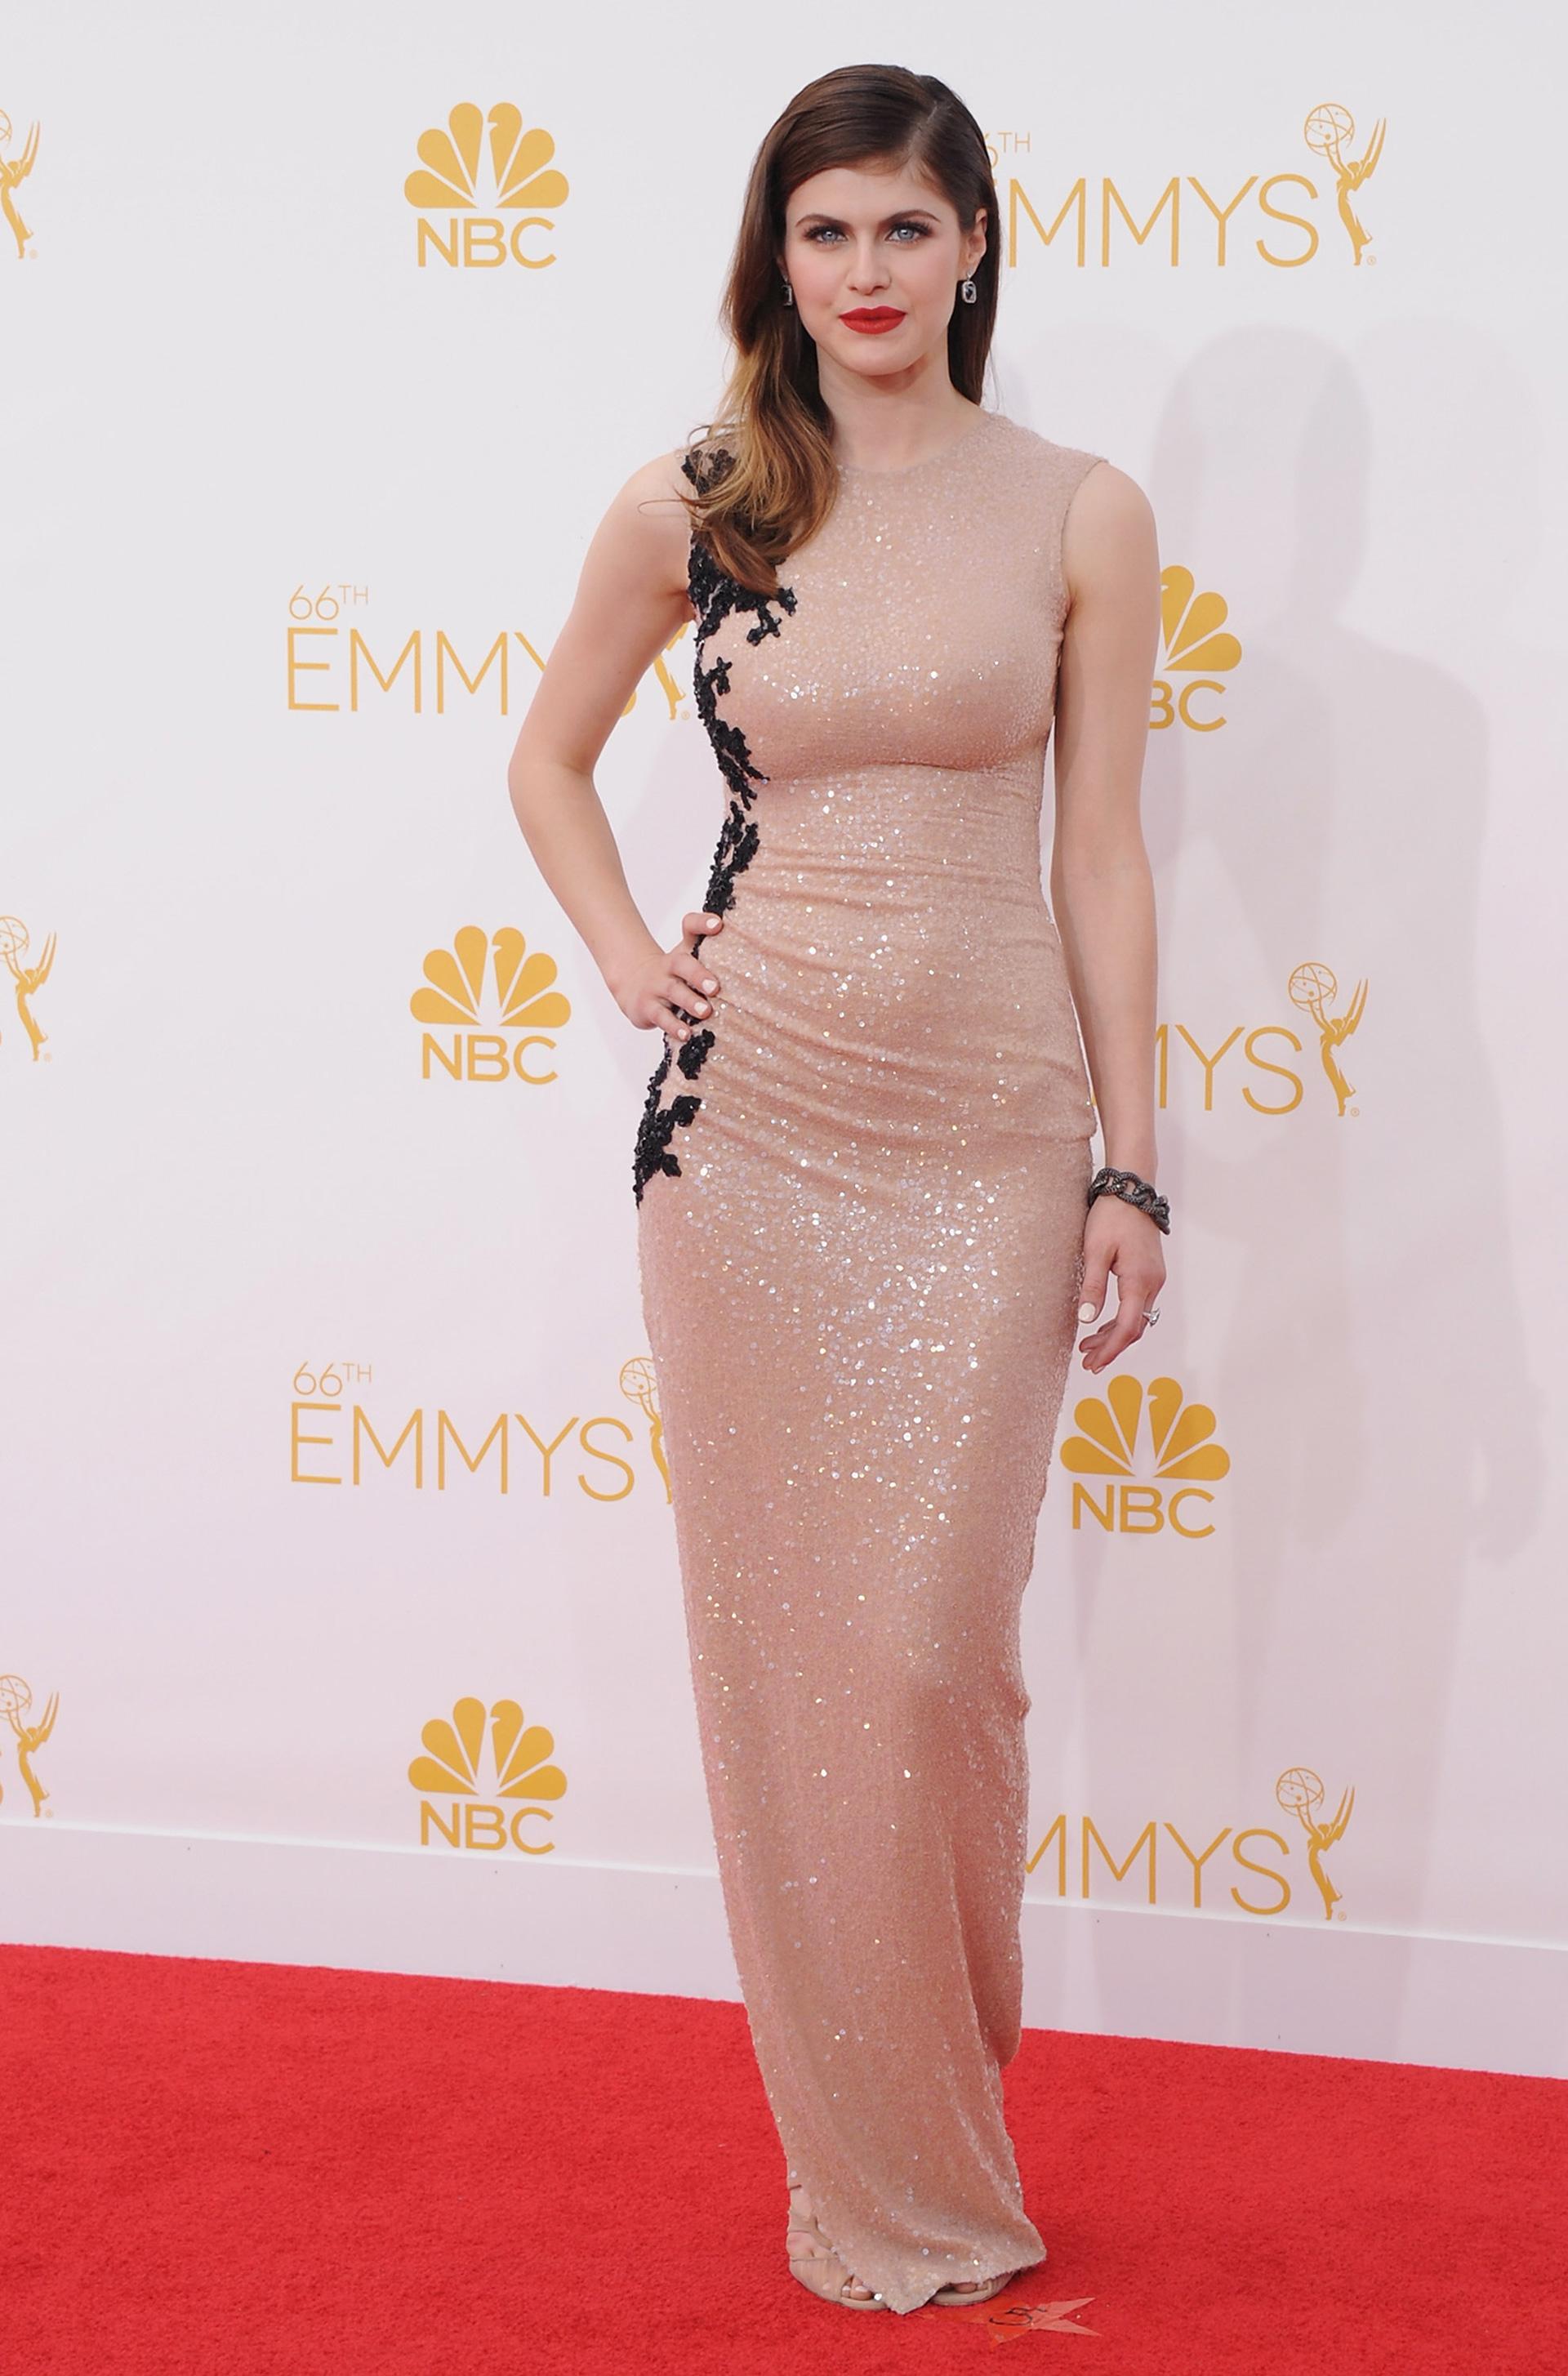 Alexandra Daddario at the Emmy's